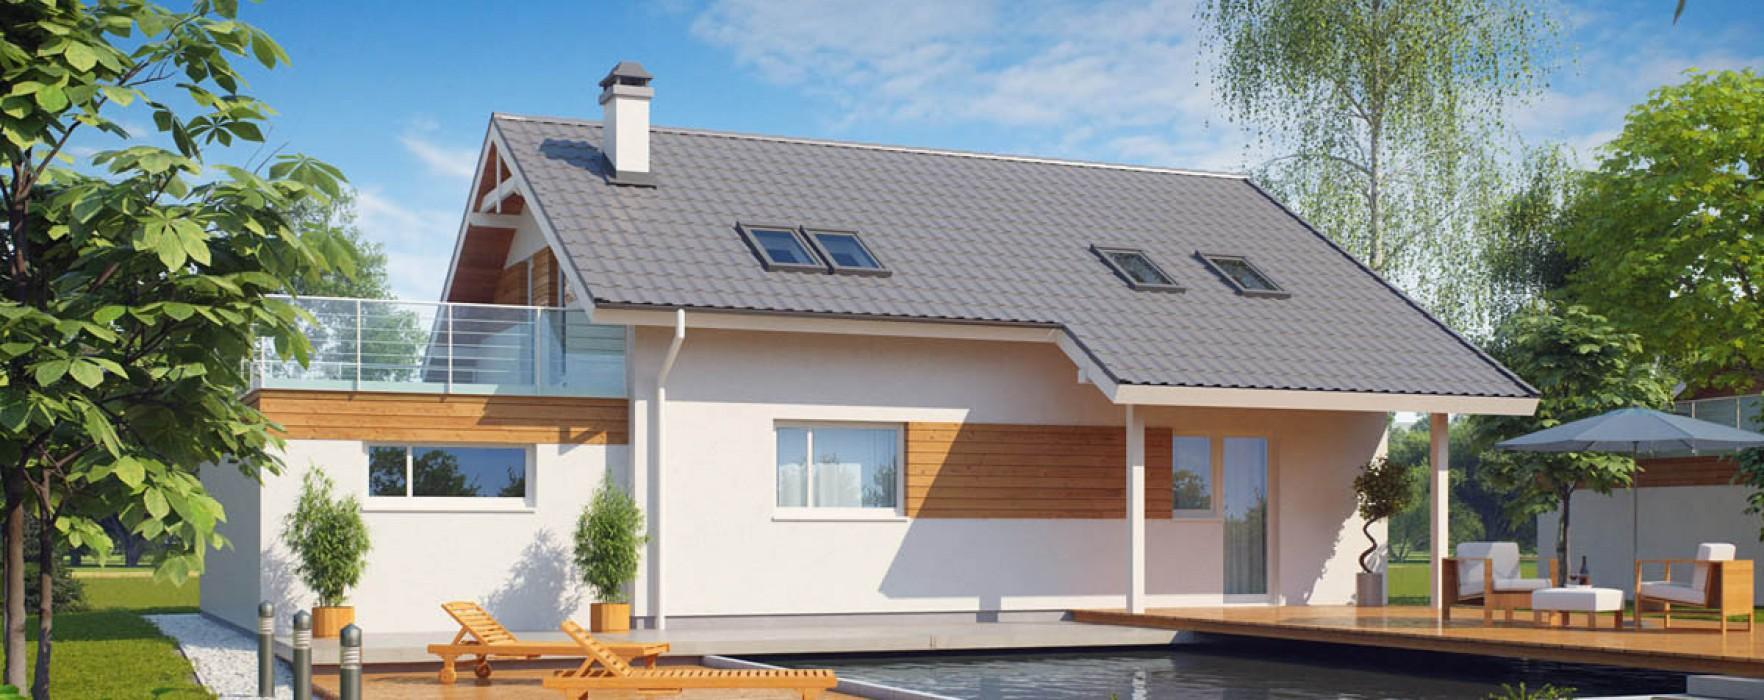 Casa prefabbricata in legno offerta tornatore case in legno - Prezzo casa prefabbricata in legno ...